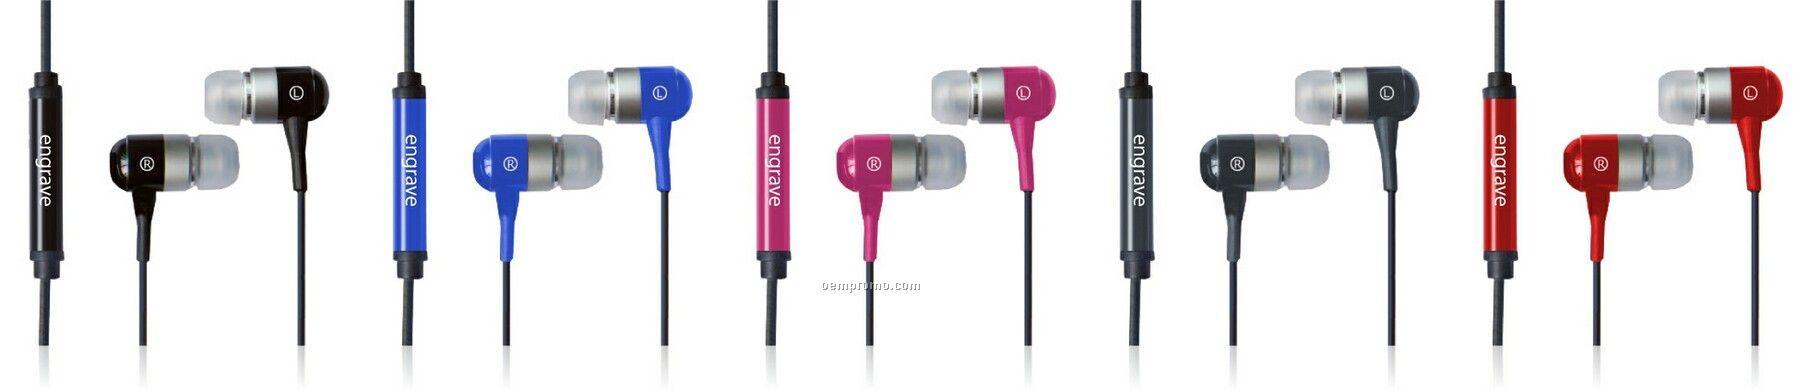 Metal Ear Buds (Model Ebm01)